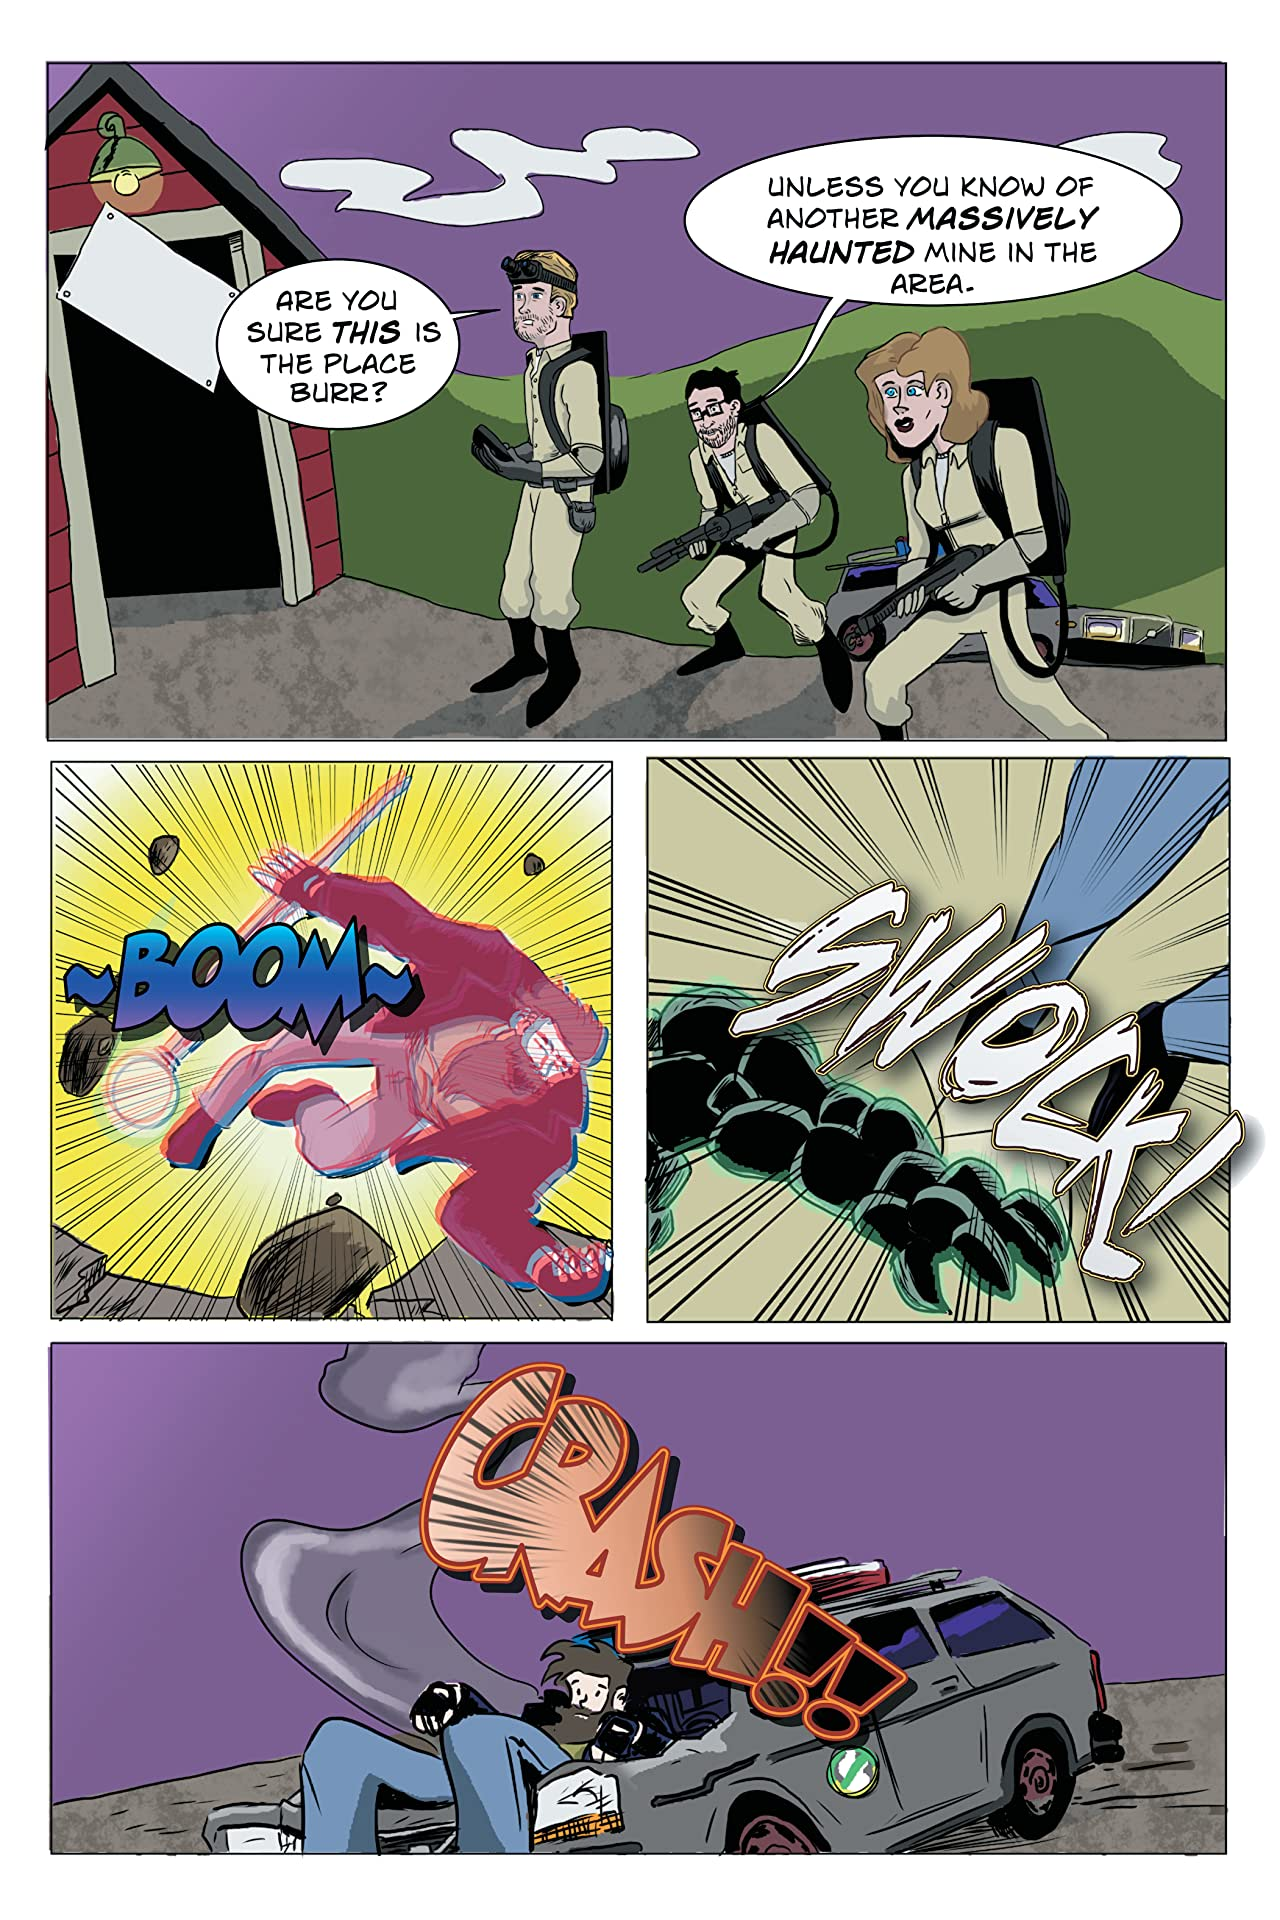 The Adventures of Auroraman #5